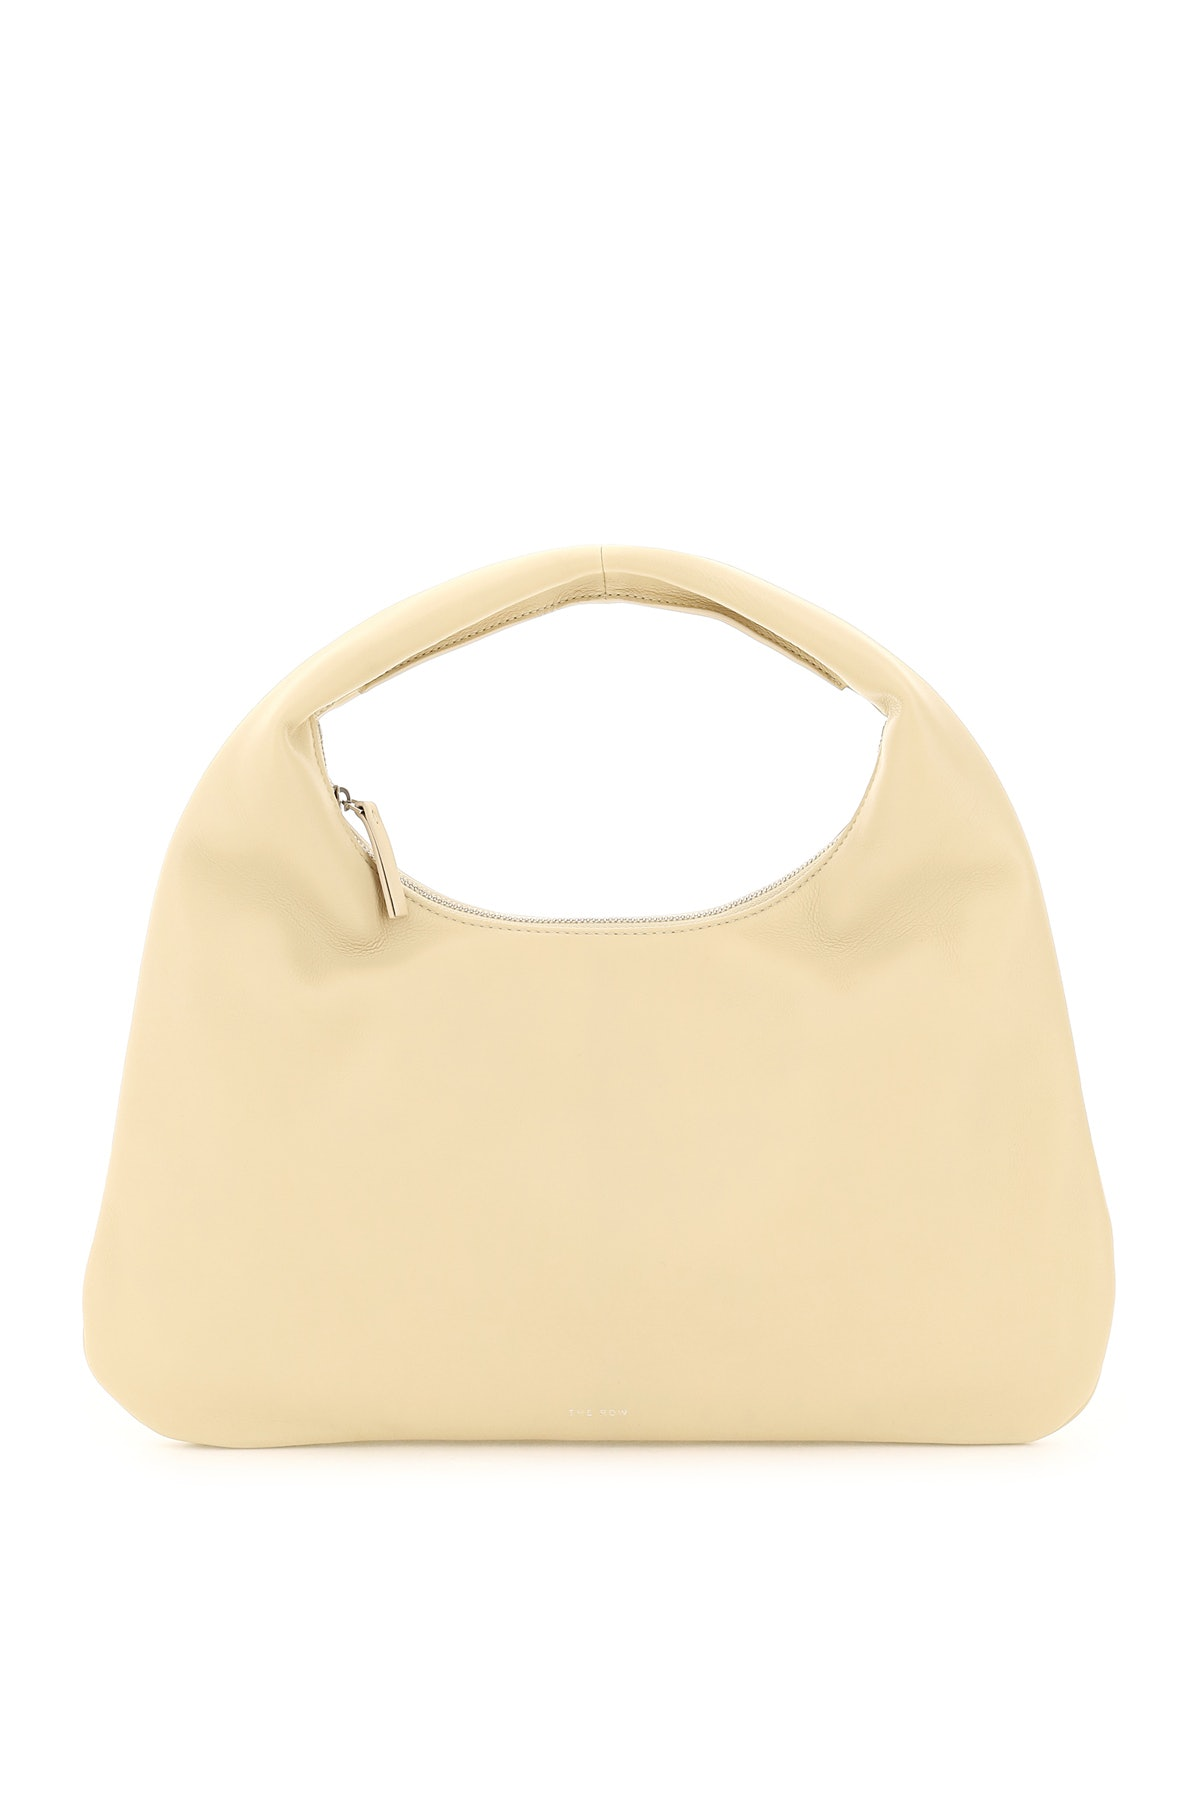 The Row Everyday Small Leather Hobo Bag: image 1